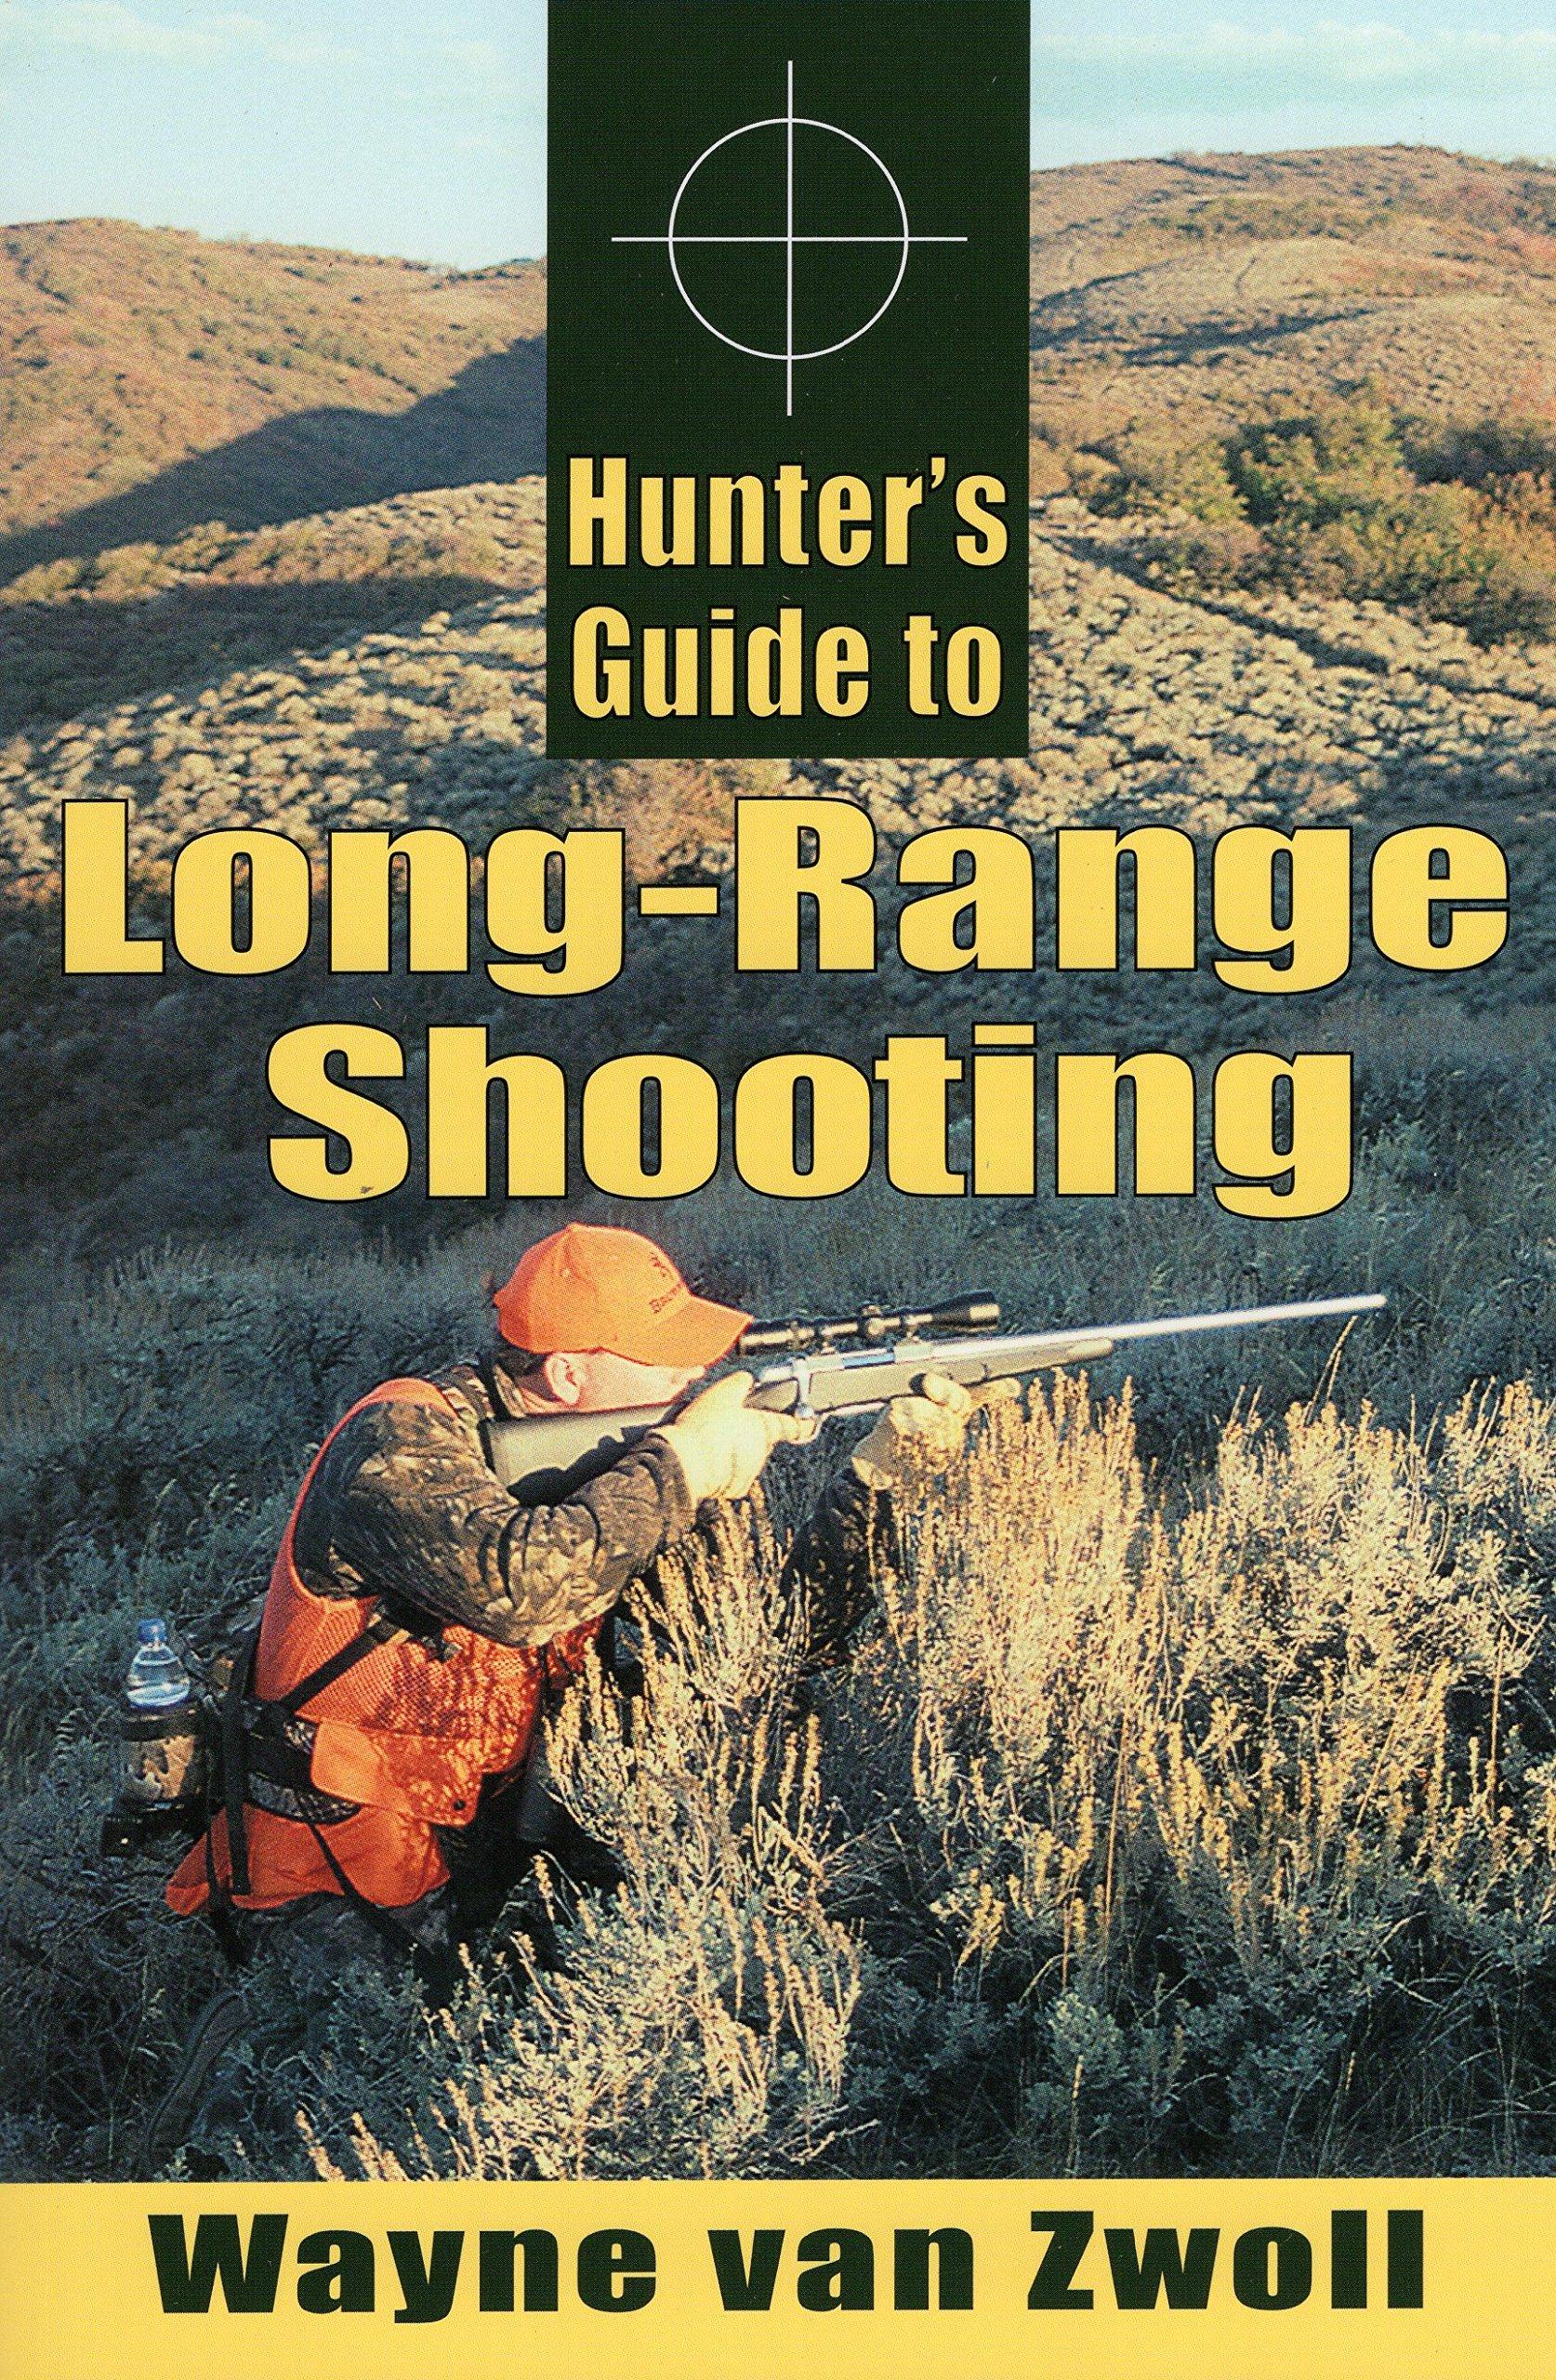 Hunter's Guide to Long-Range Shooting pdf